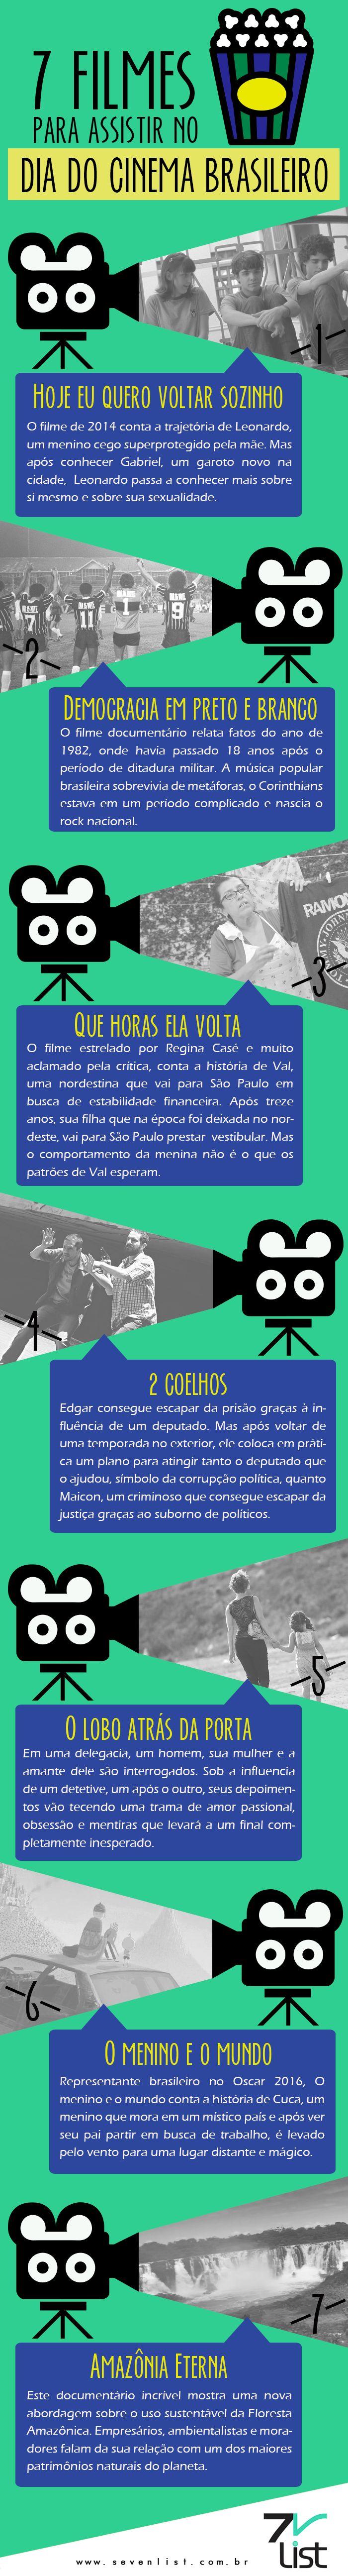 #Cinema #Brasil #Filmes #Entretenimento #Infográficos #Movies www.sevenlist.com.br